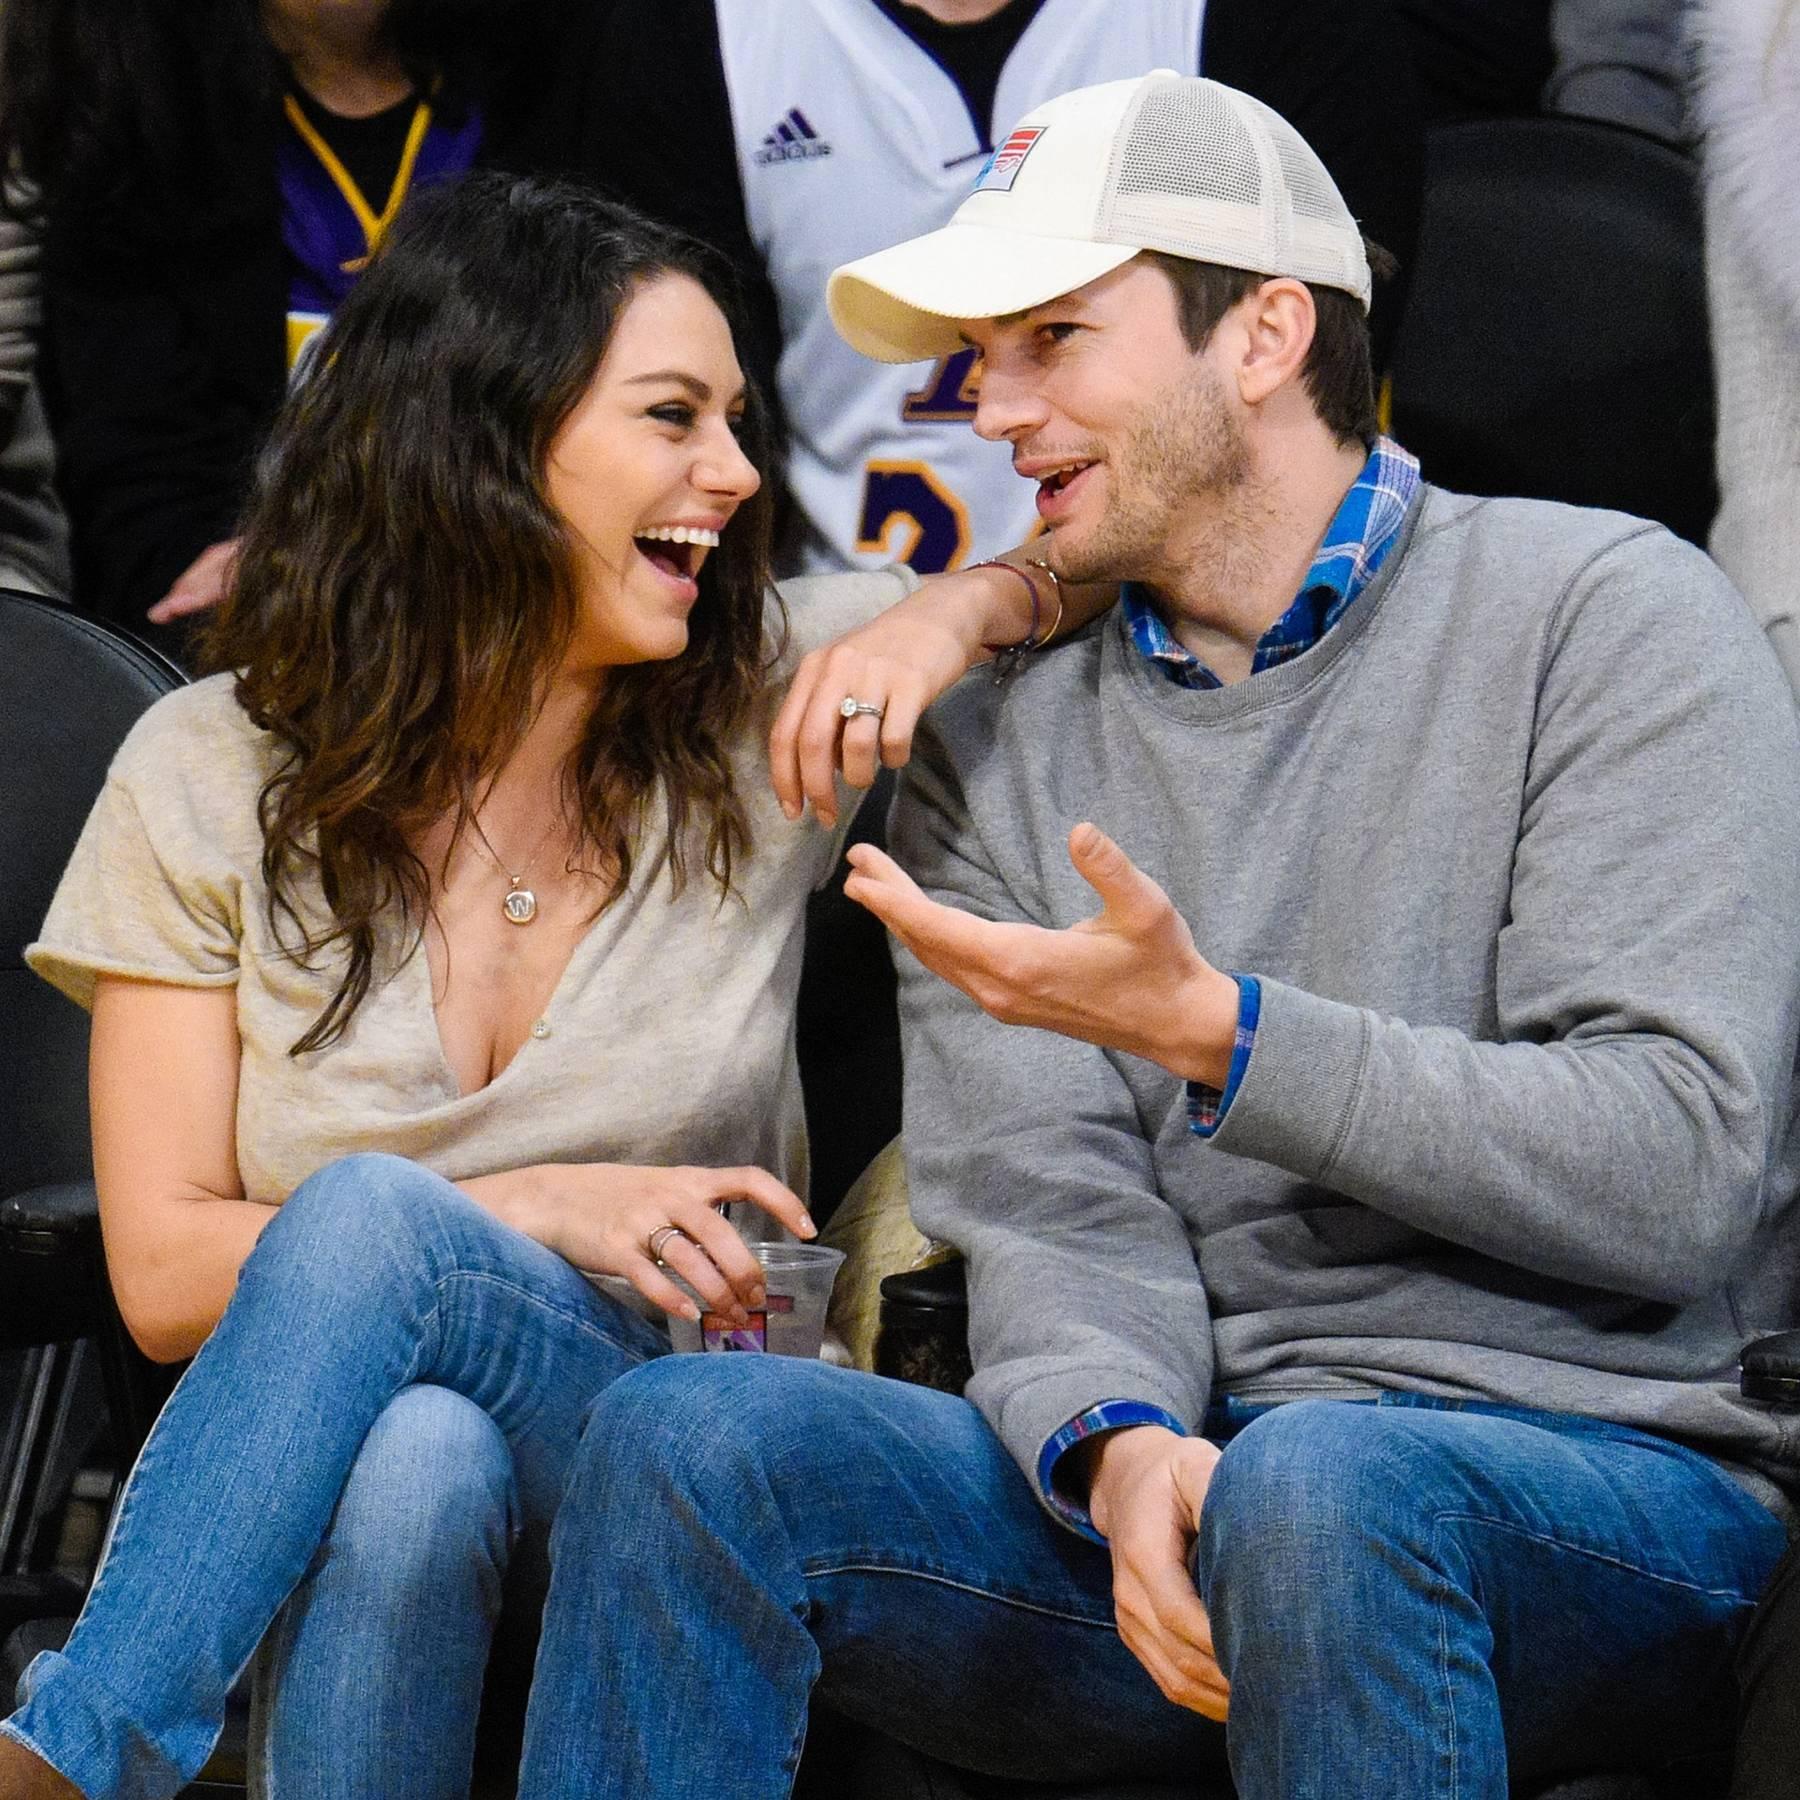 ashton kutcher and mila kunis began dating